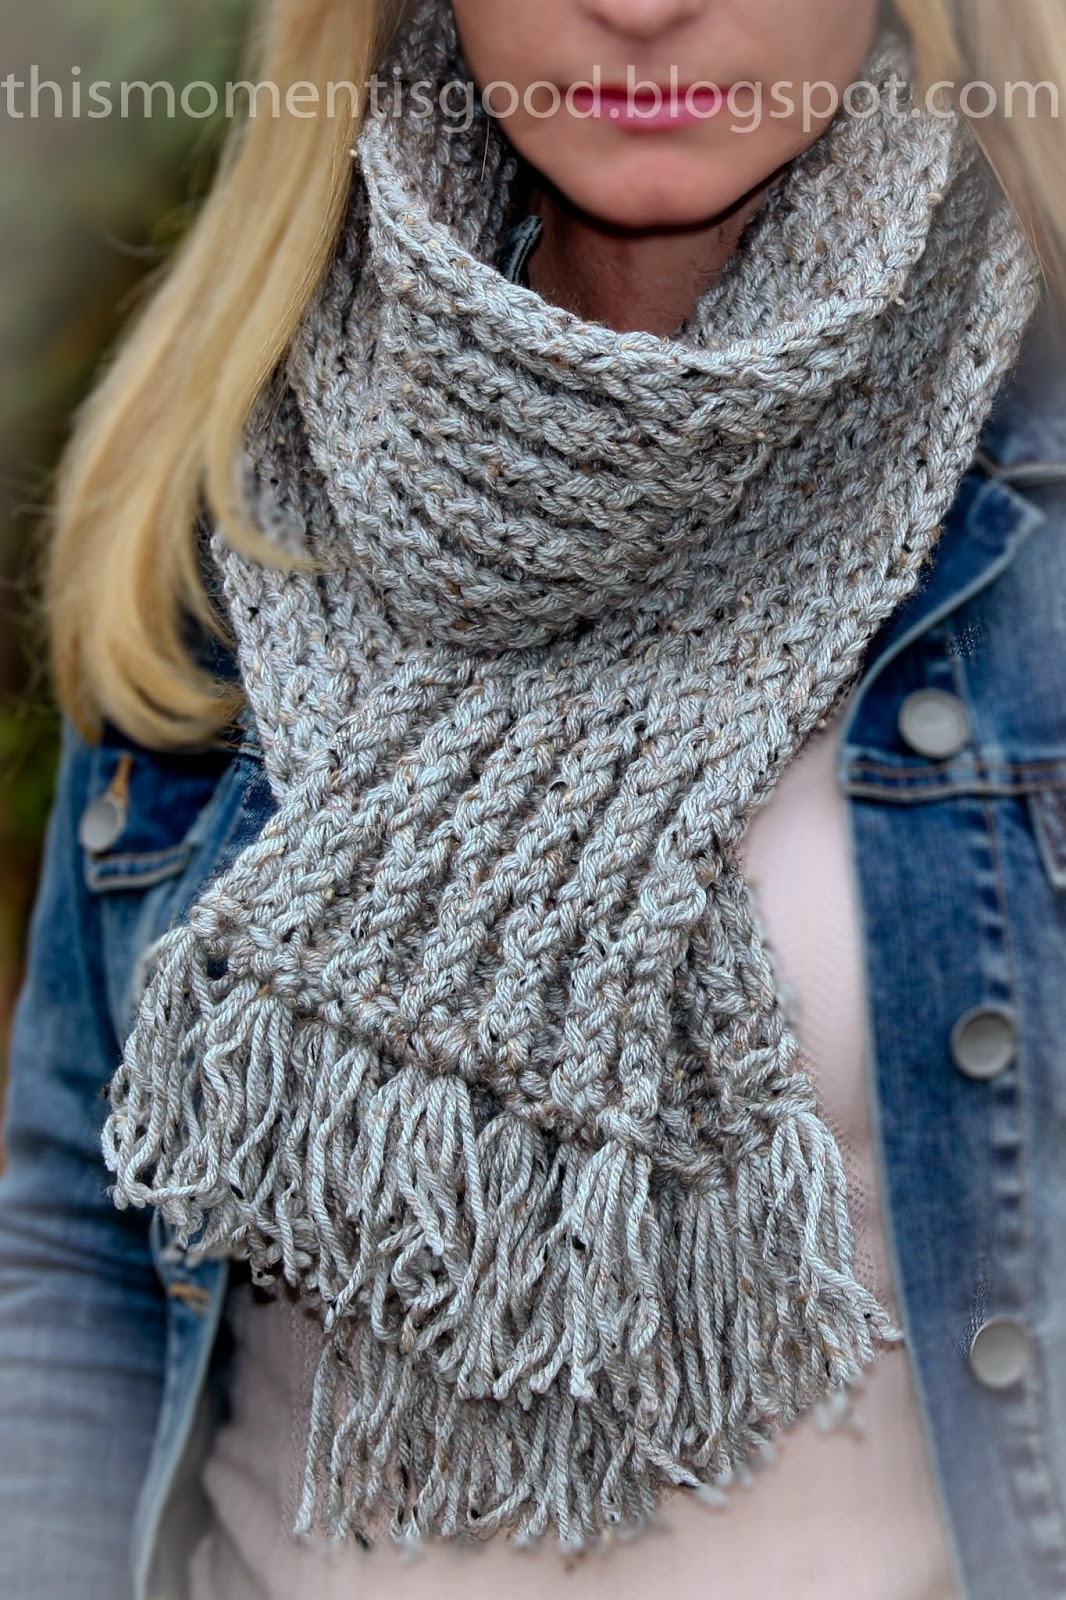 LOOM KNIT: ELEGANT HONEYCOMB SCARF | Loom Knitting by This ...